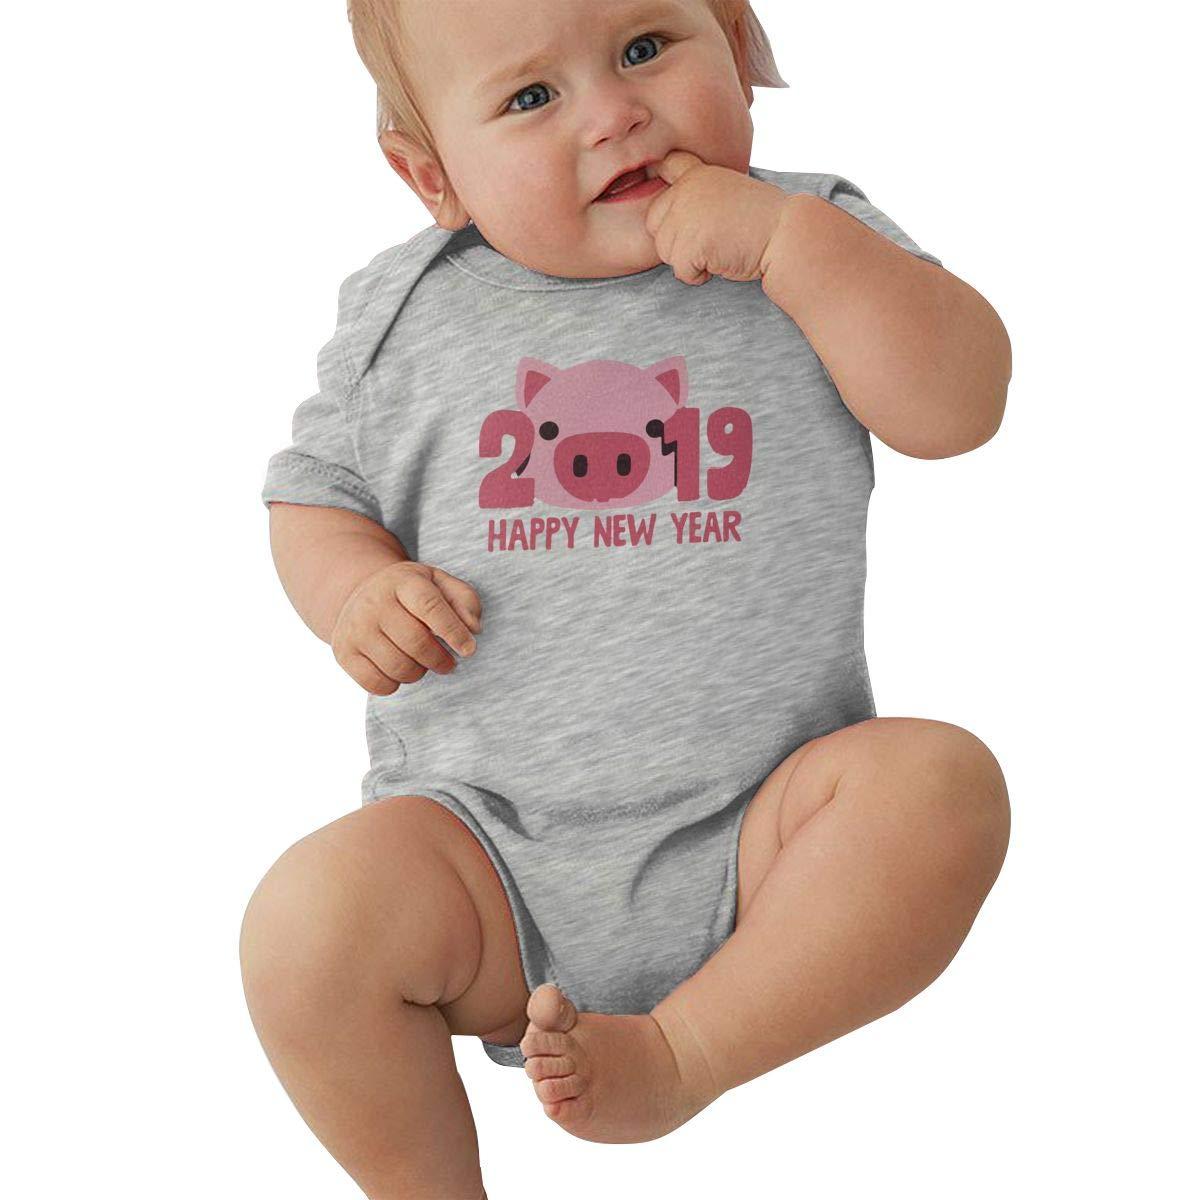 Newborn Baby Girl Boy 2019 Happy New Year Cute Pig BodysuitRomper Jumpsuit Short Sleeve Bodysuit Tops Clothes